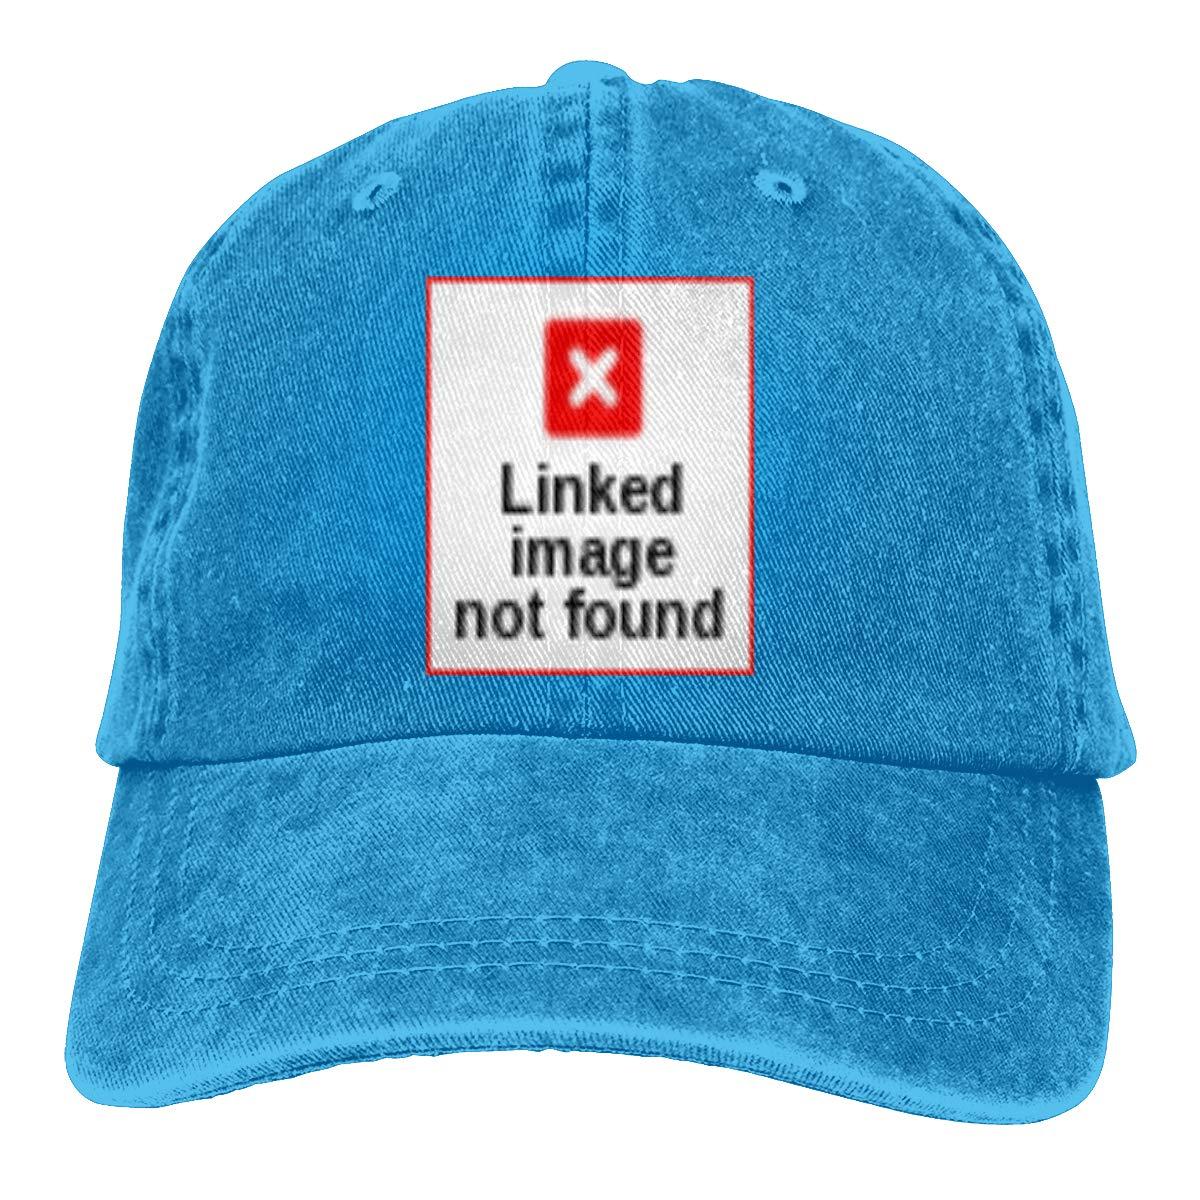 Adult Unisex Cowboy Cap Adjustable Hat Gorilla Cotton Denim